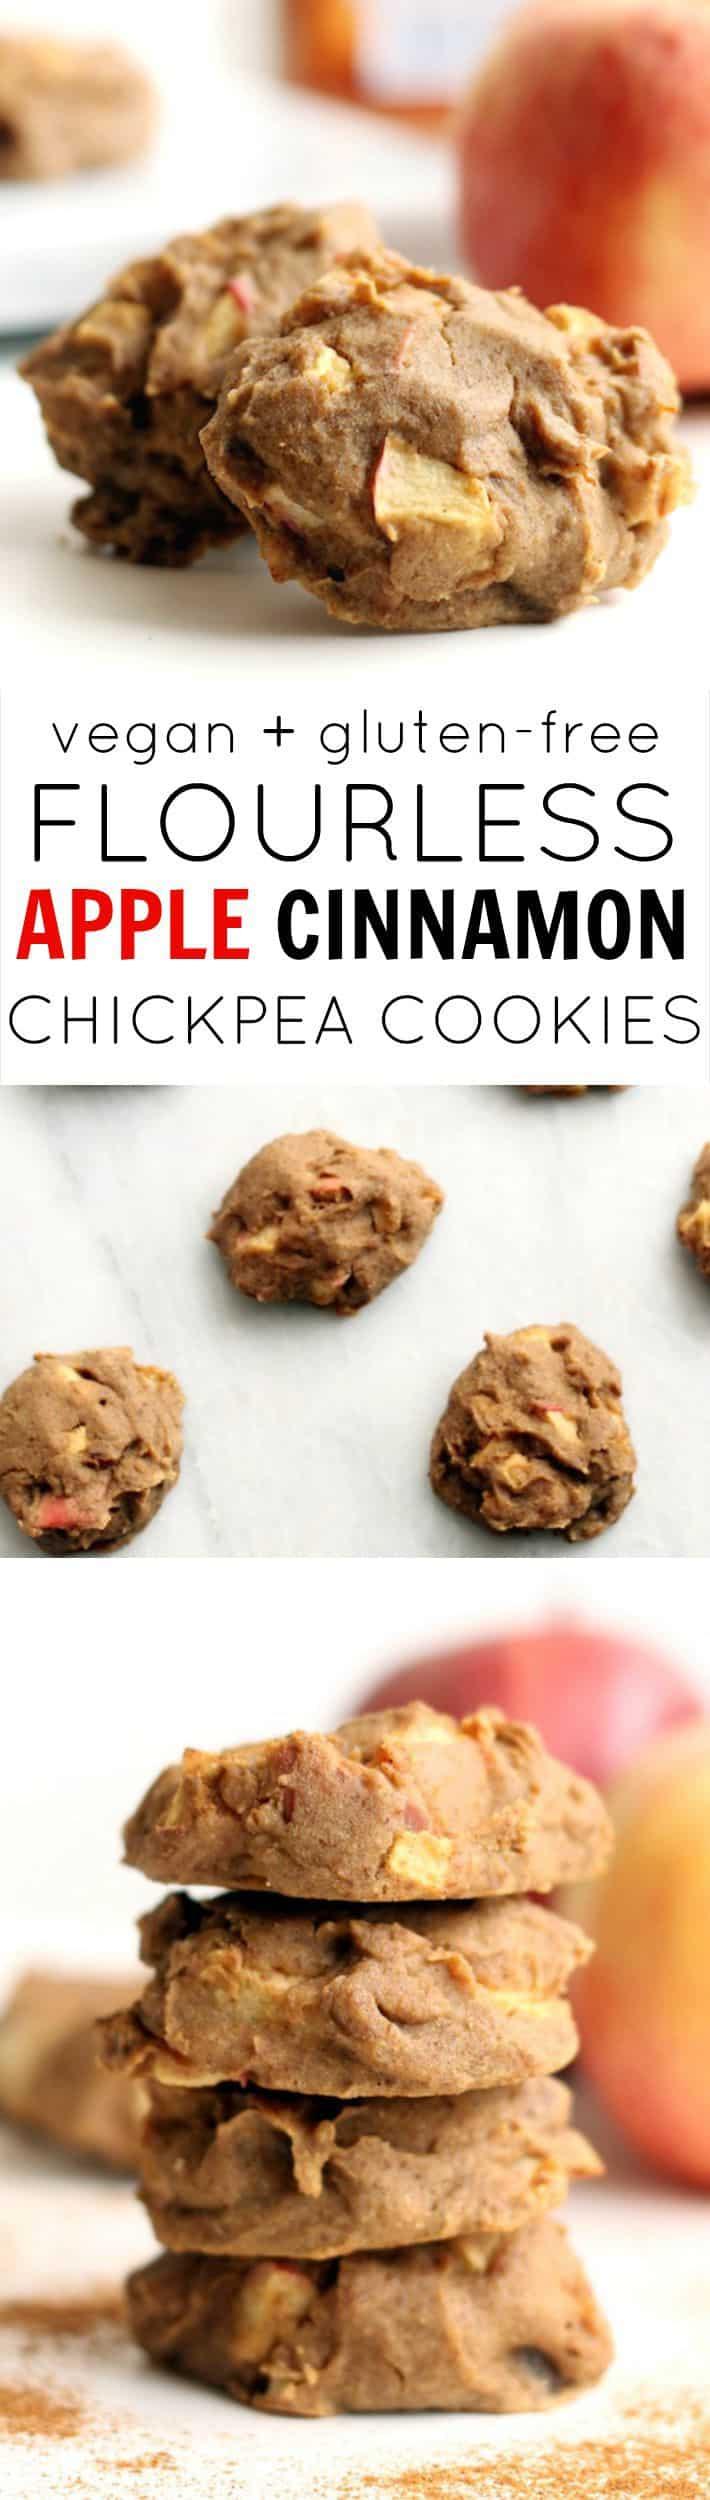 Flourless Apple Cinnamon Cookies are a super moist, lightluy sweetened, vegan, kid-friendly treat! No oil, flour, butter, or refined sugar.